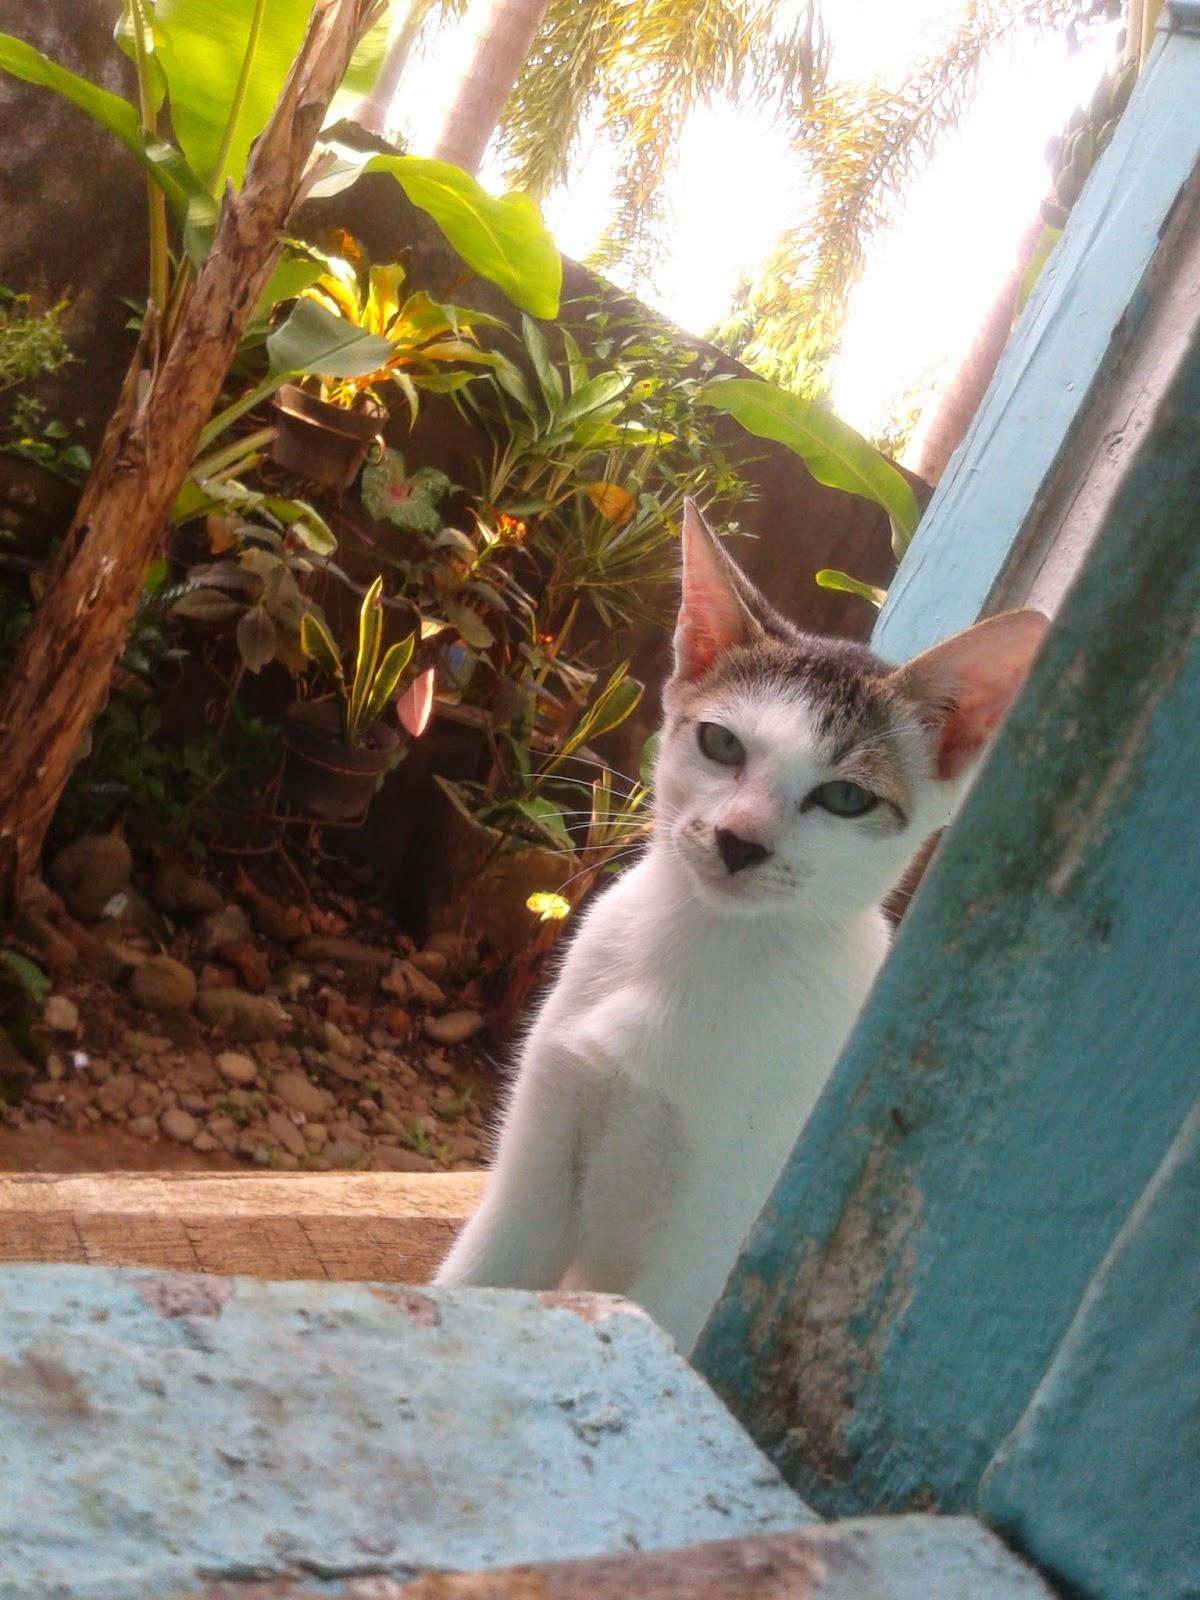 Putri Rahayulia Bagaimana Cara Menyembuhkan Kucing